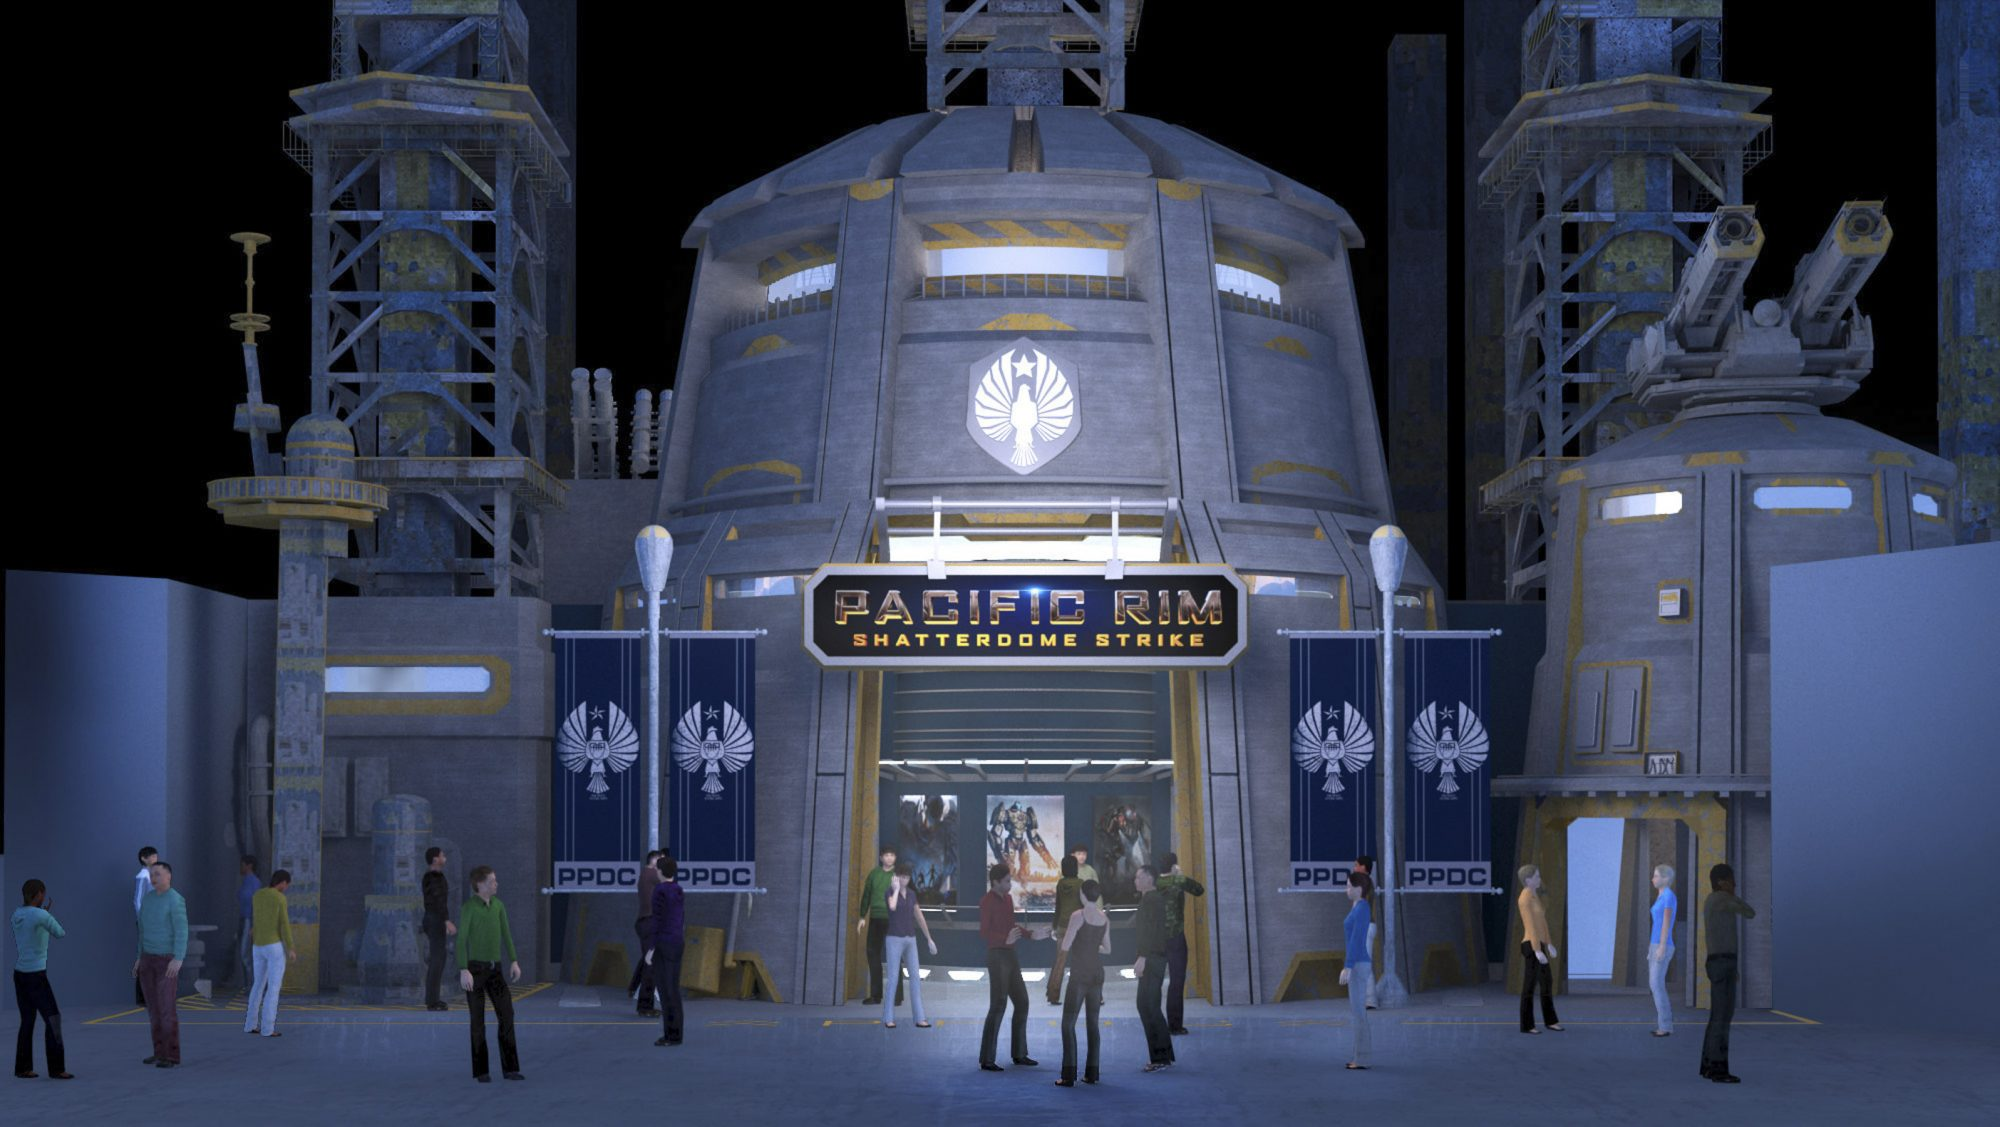 Pacific Rim: Shatterdome Strike Attraction Entrance Concept Art